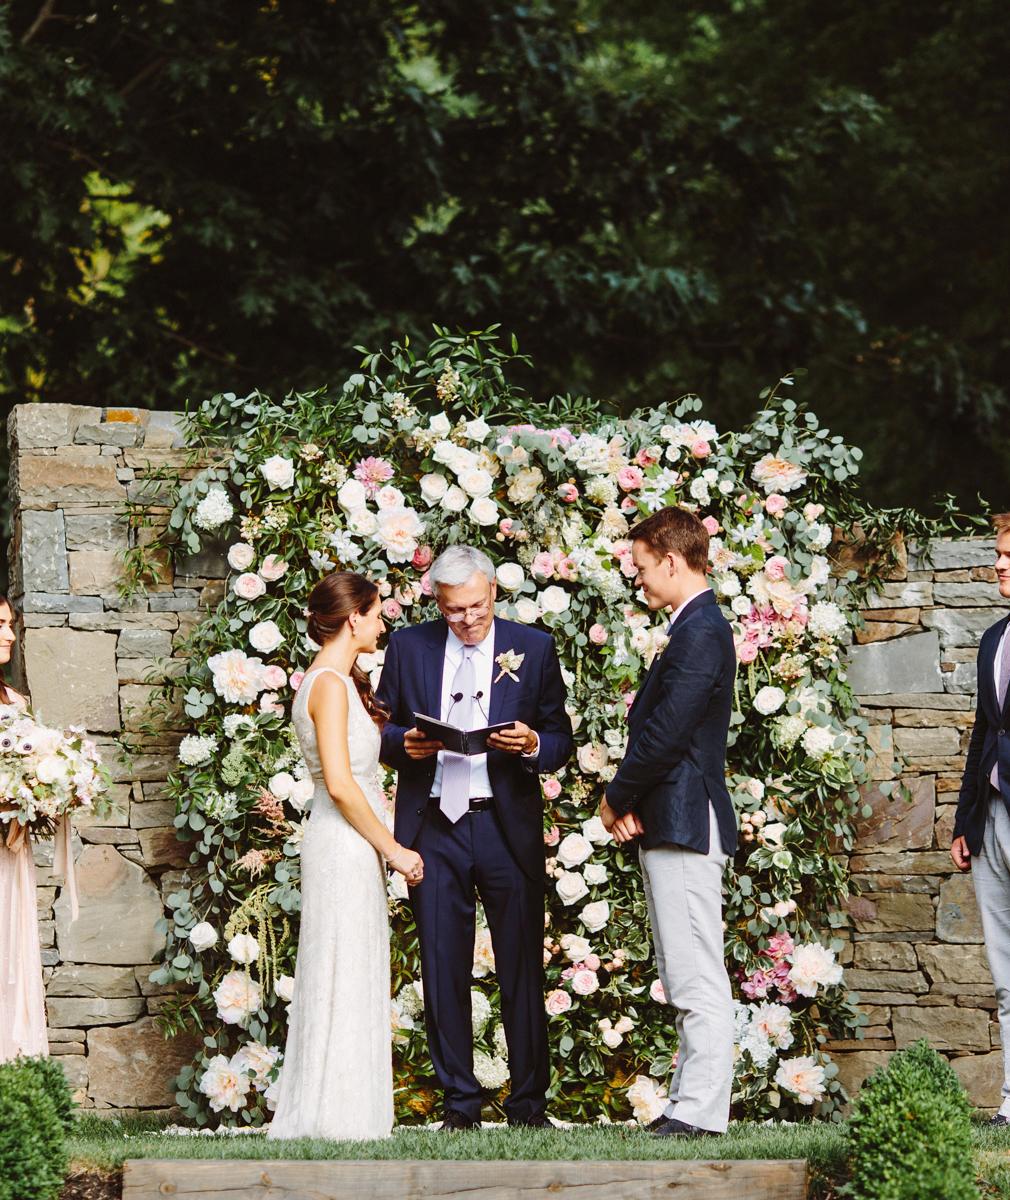 wedding garden backdrop roses peonies hydrangea